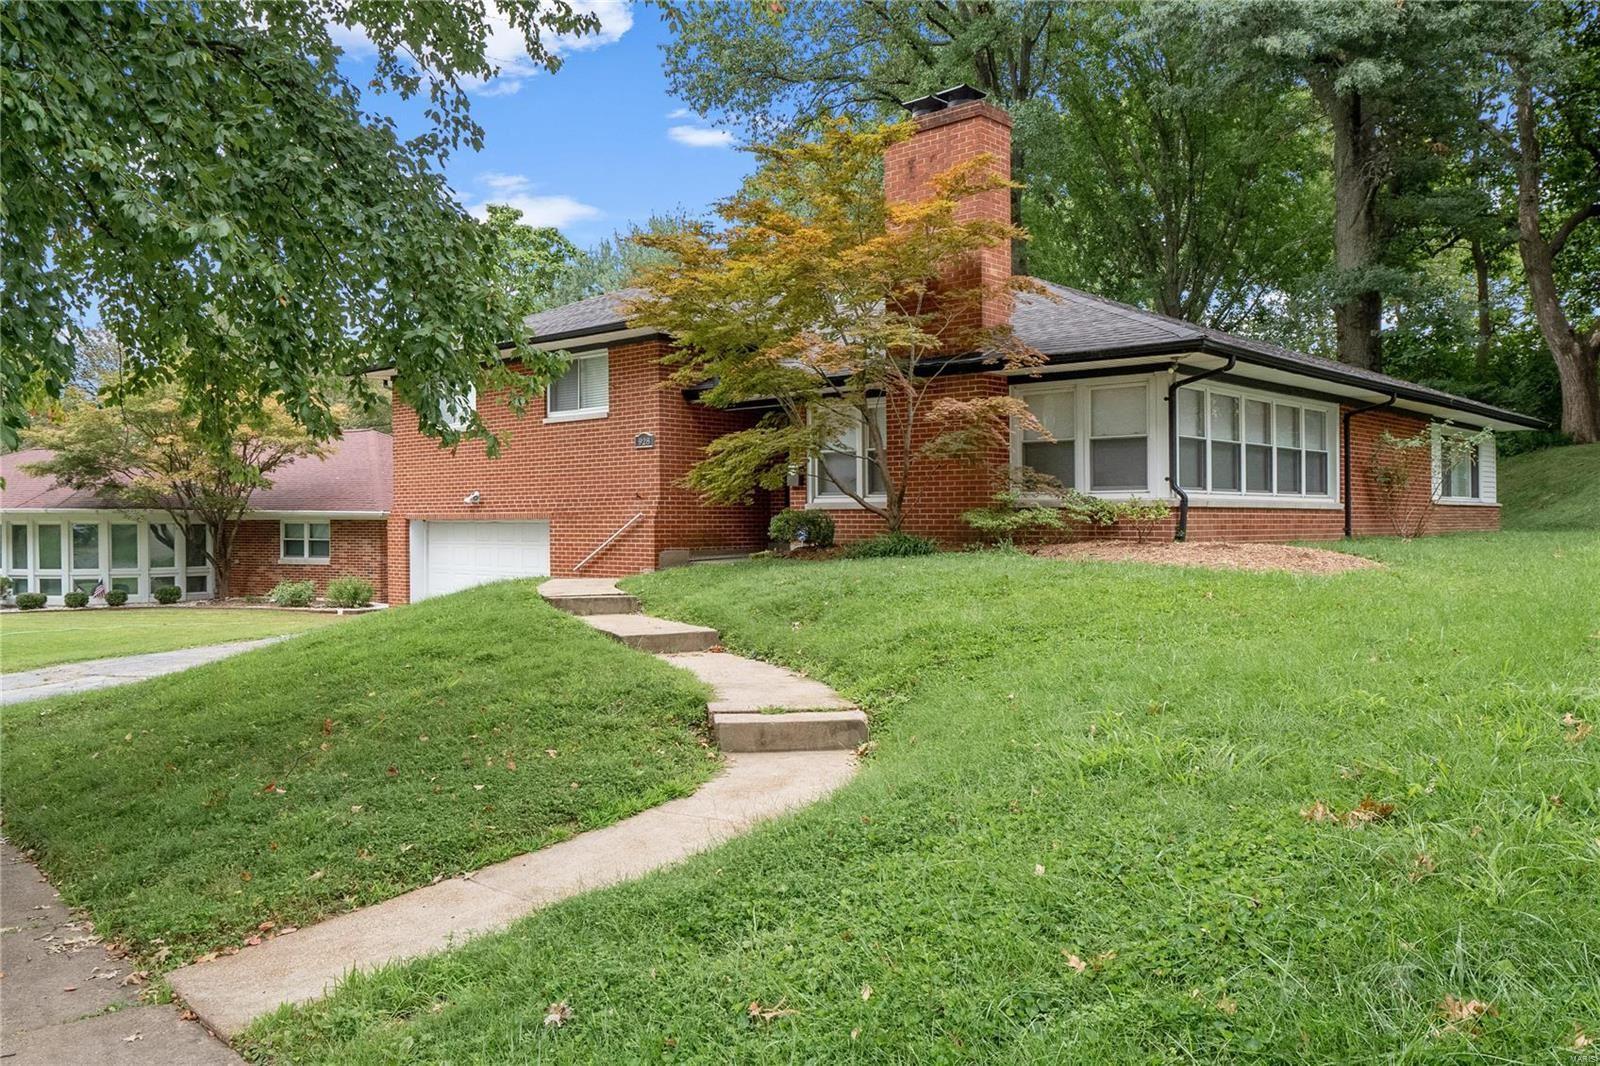 928 Briarwood Ln, University City, MO 63130 - #: 20064247